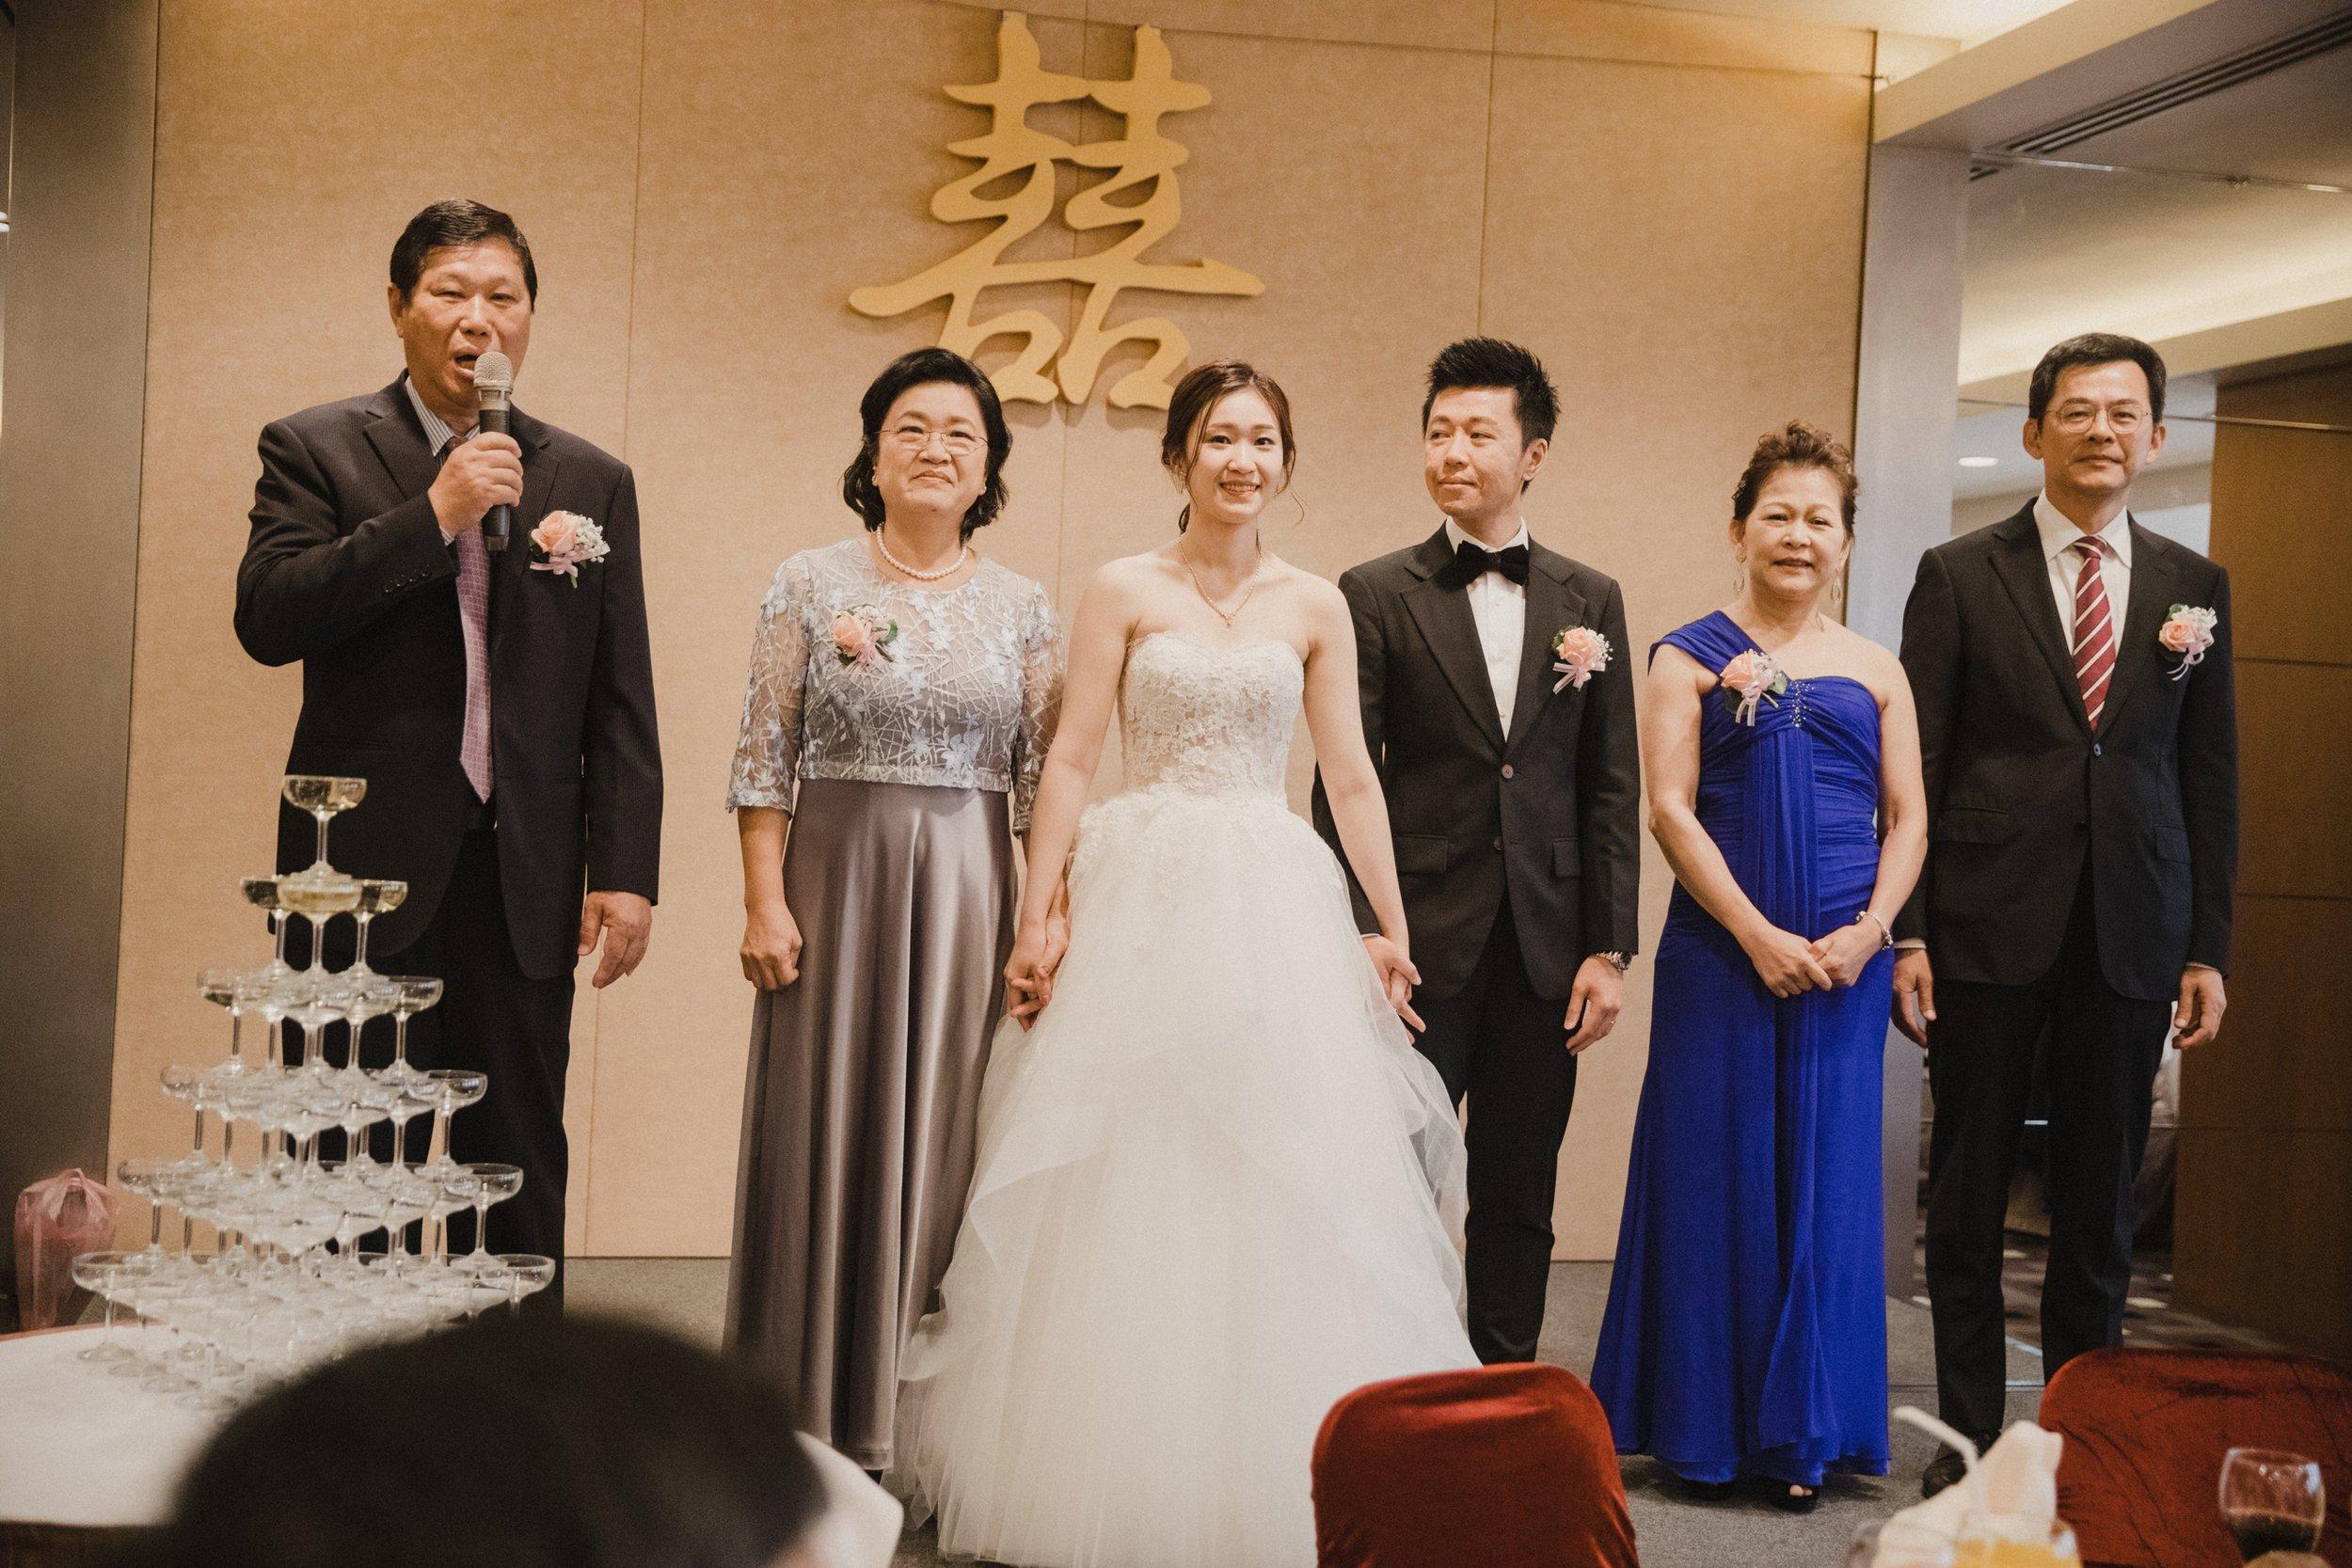 wedding-caridee-oscar-lunch-ambassador-hsinchu-結婚午宴-新竹國賓_86.jpg